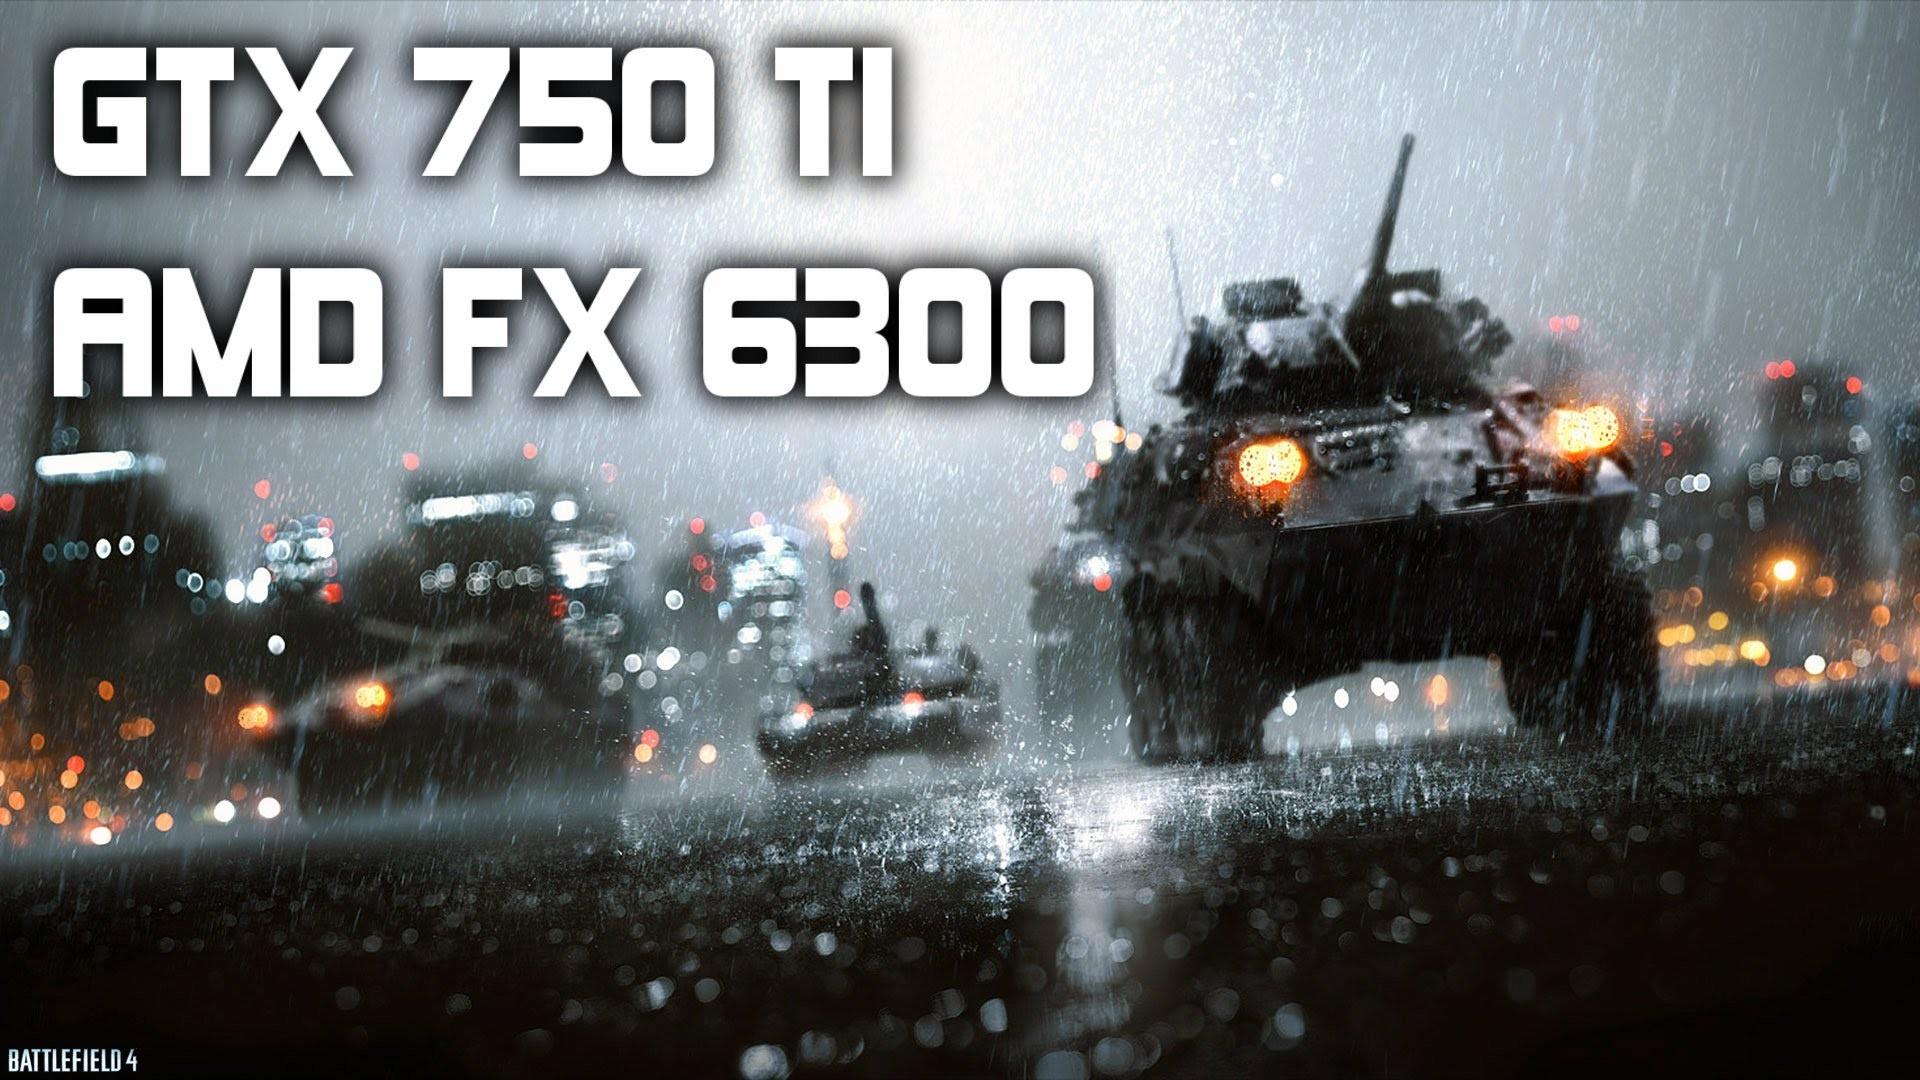 Battlefield 4 – High Settings – AMD FX 6300/GTX 750 Ti (Campaign)